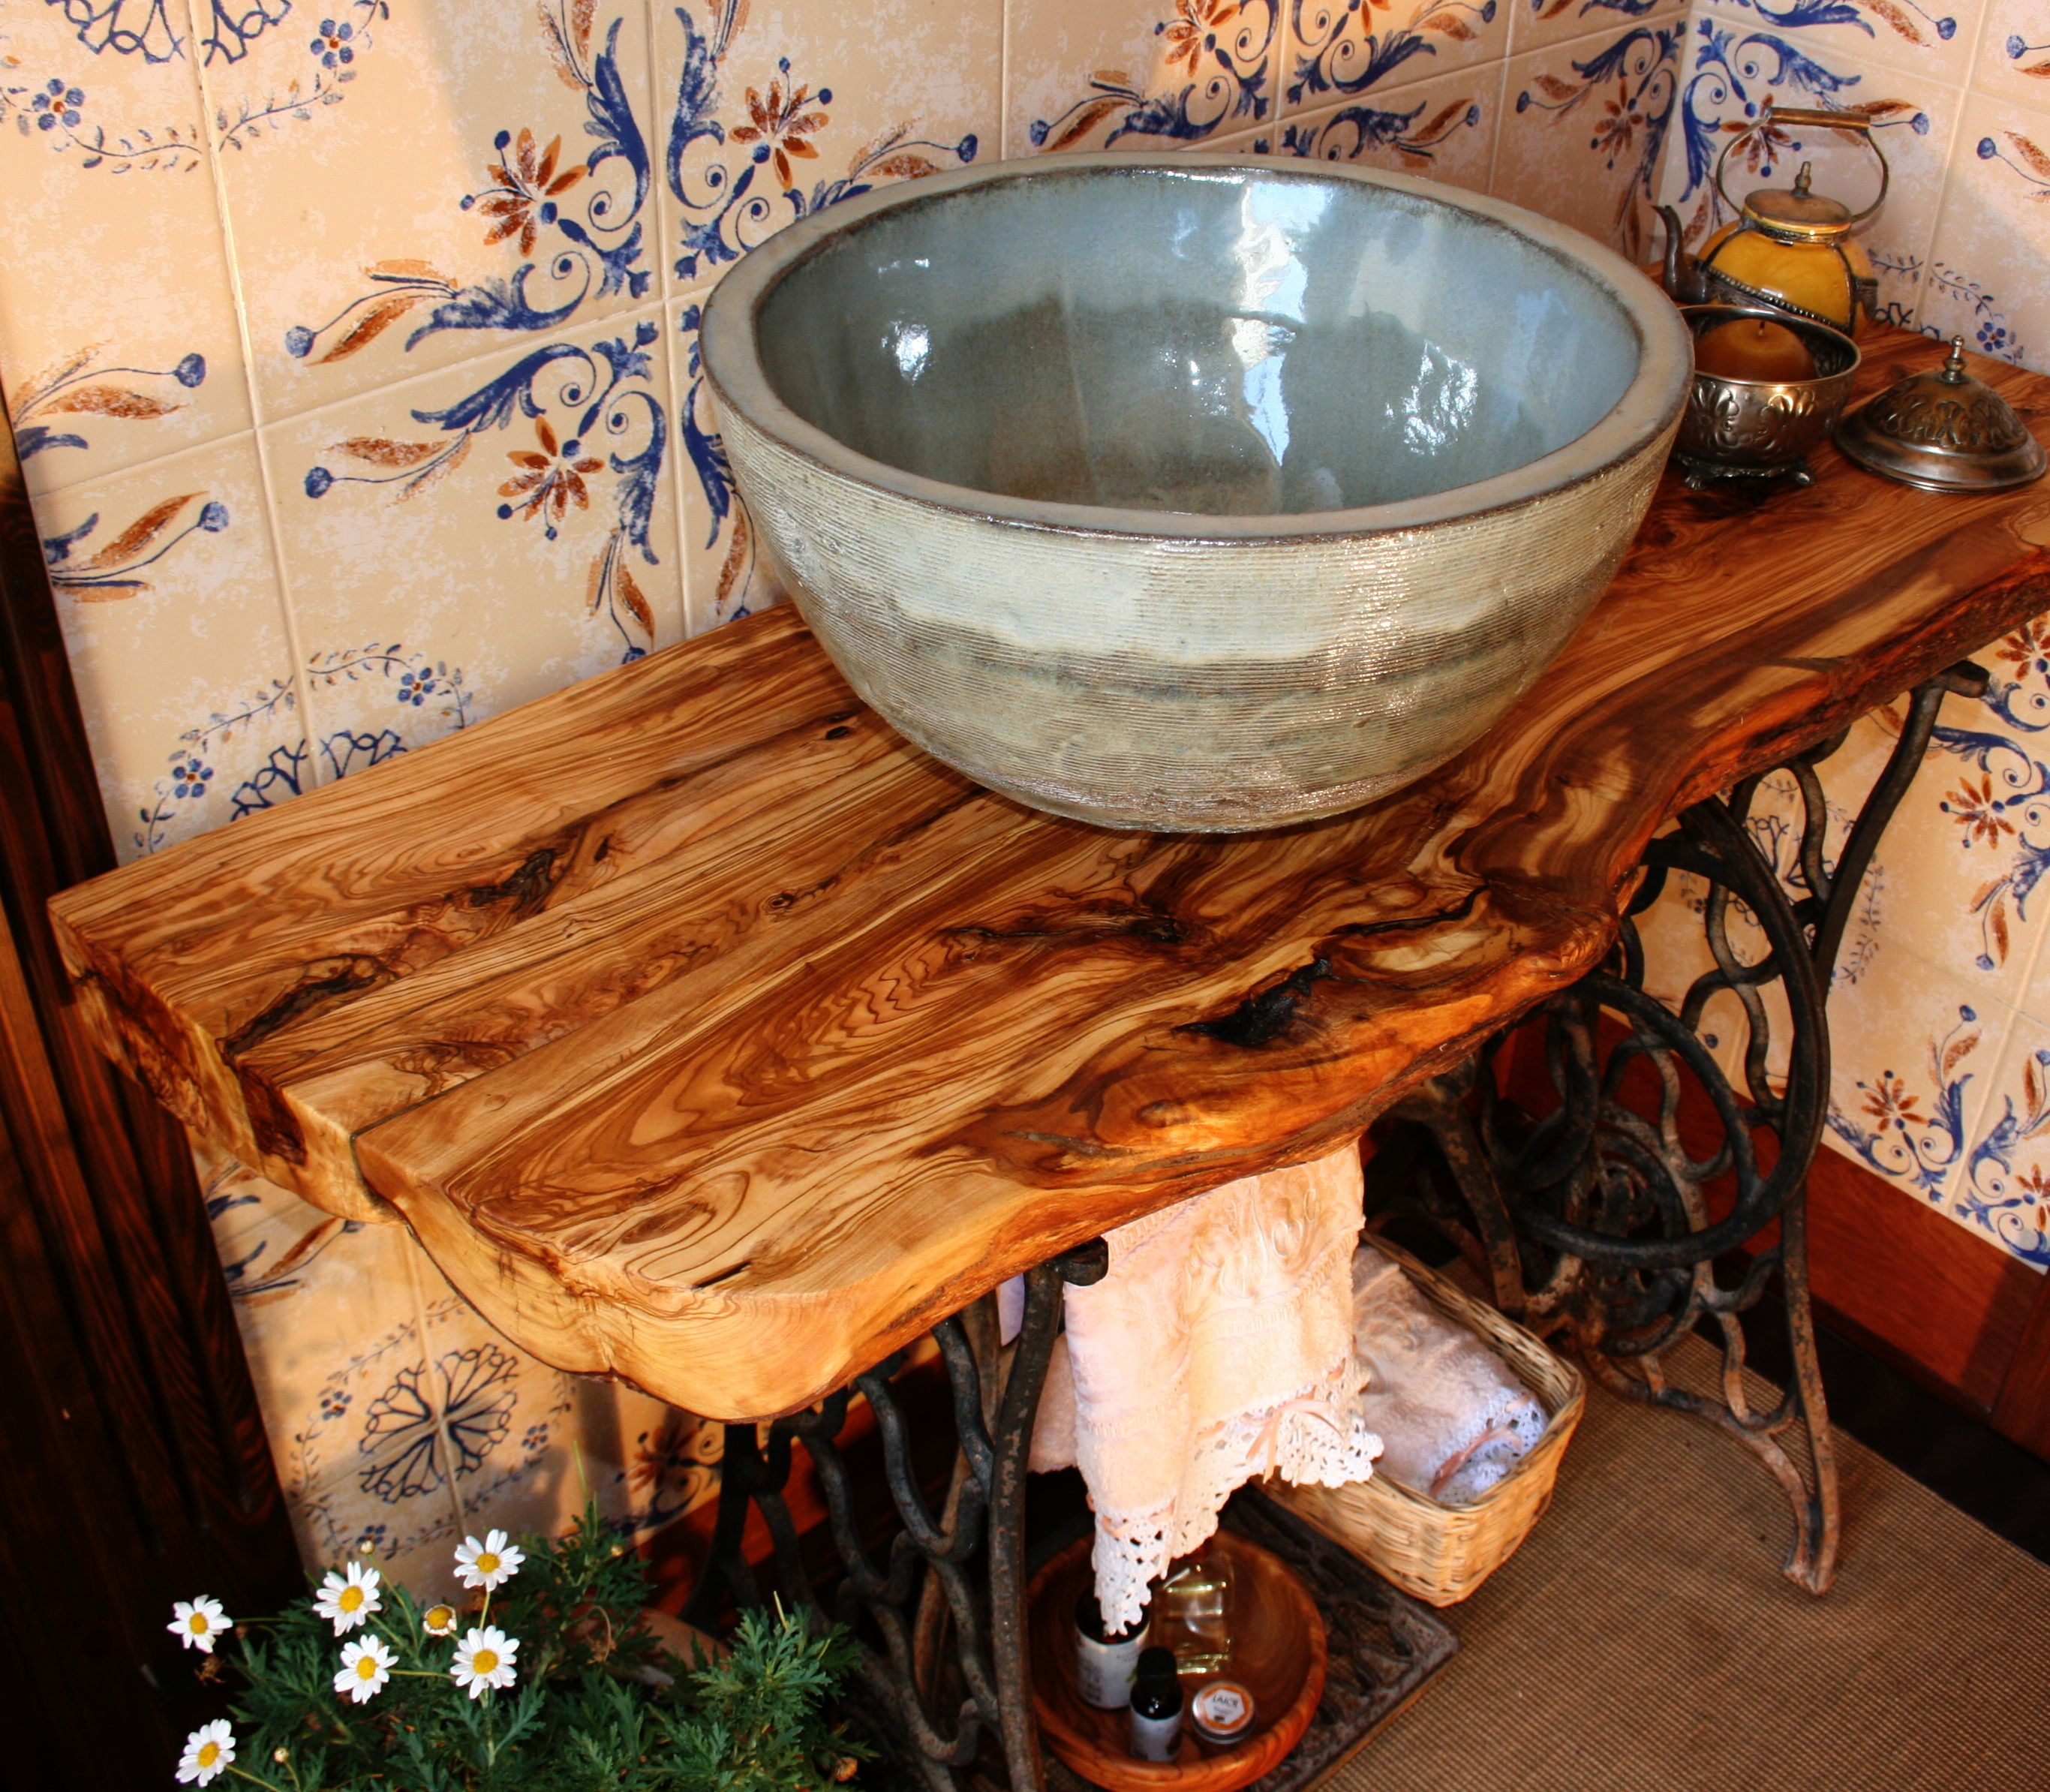 Encimera de ba o de madera de olivo ba os pinterest madera de olivo olivo y ba o - Encimeras de madera para bano ...